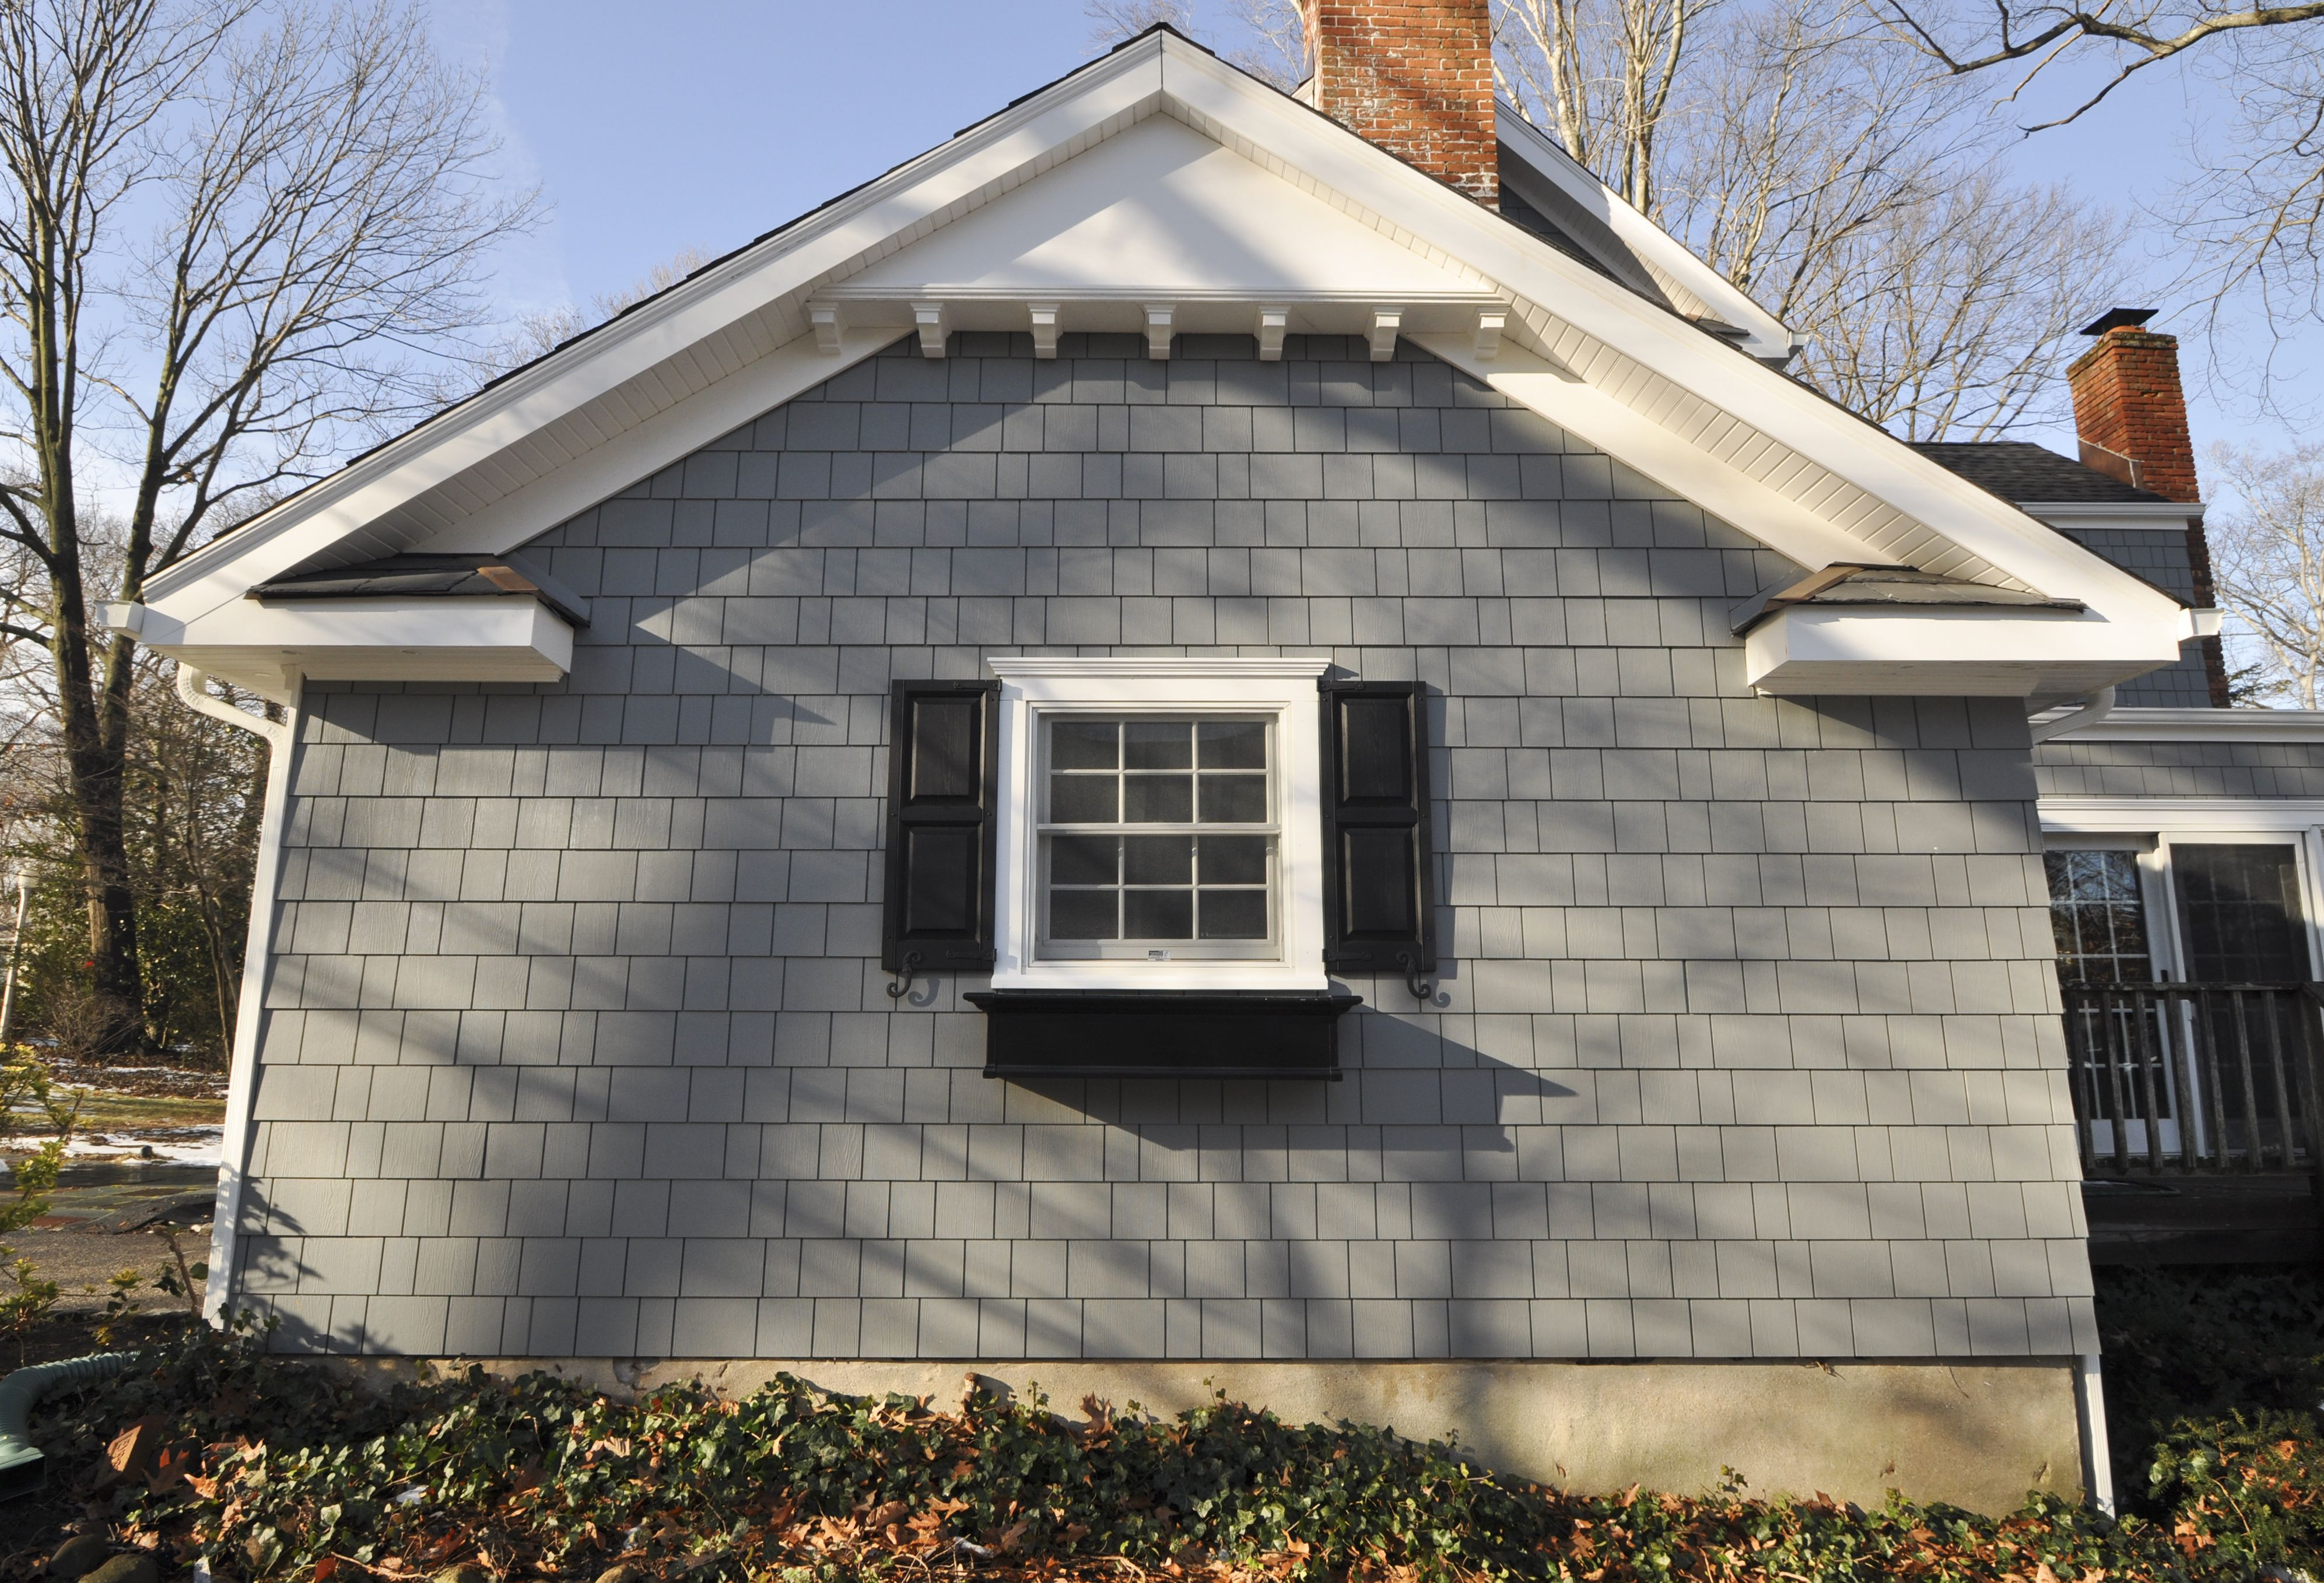 James Hardie Siding With Azek Soffit Details Andersen Windows Black And Copper Accents Dental Block Deta Installing Exterior Door House Siding Hardie Siding